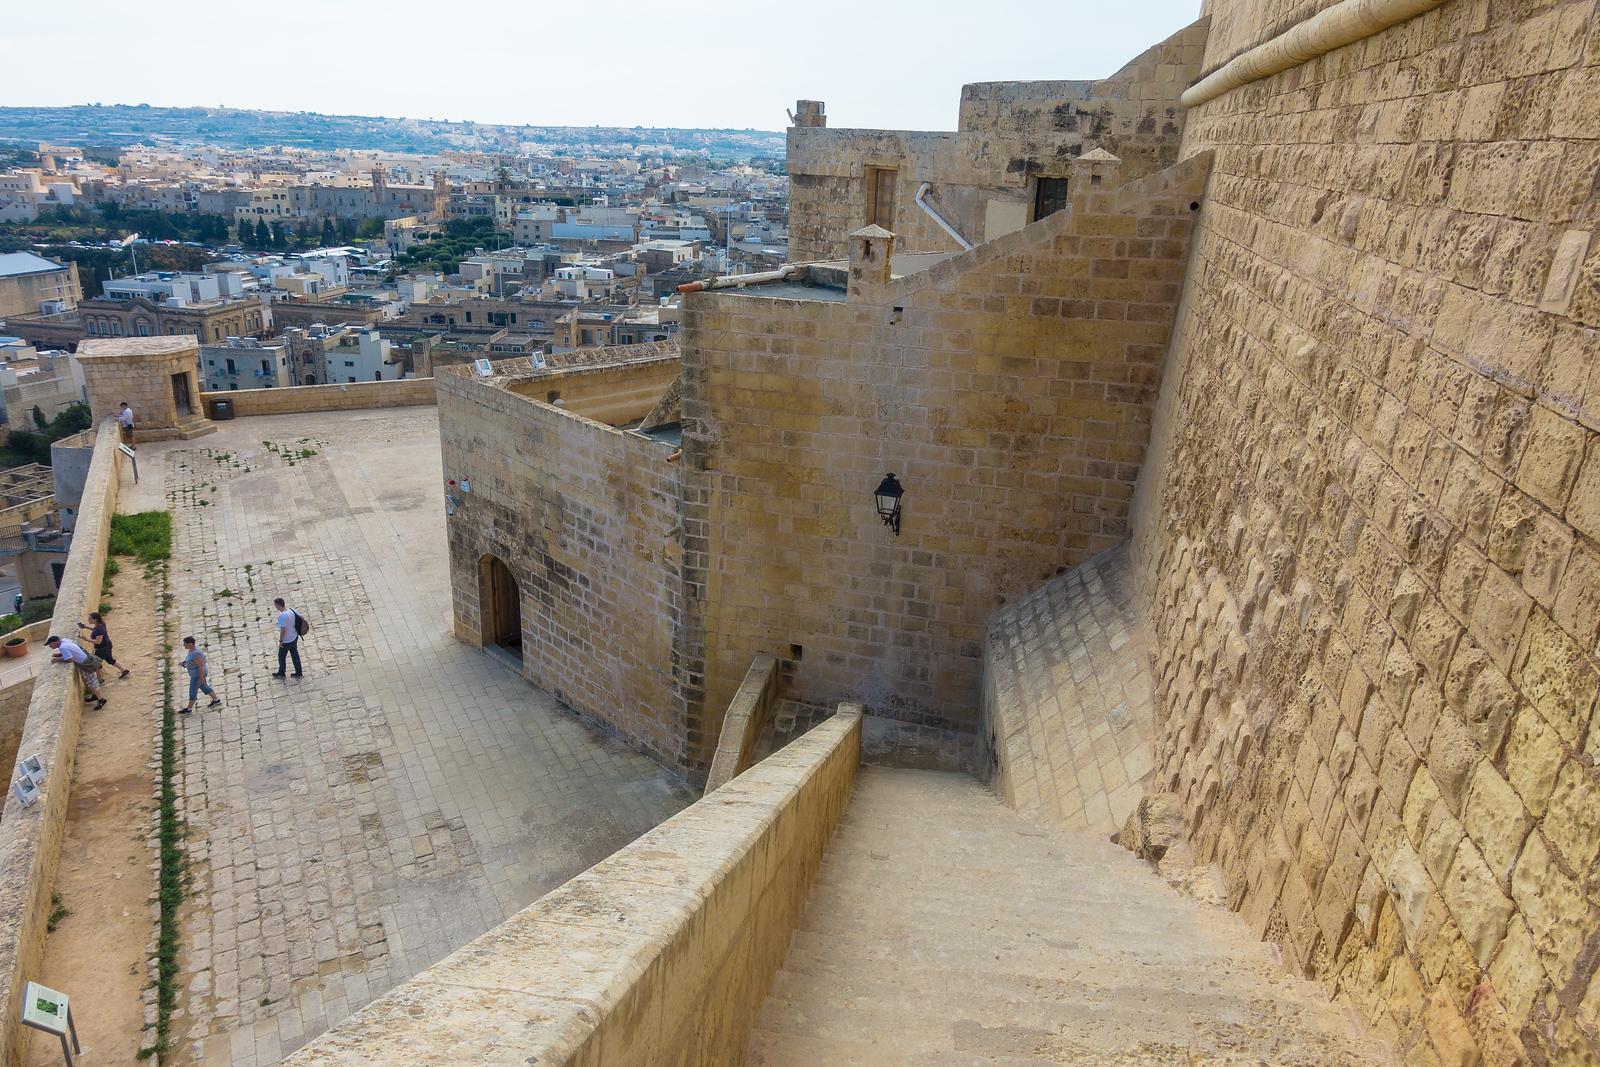 Malta Pictures - Citadella